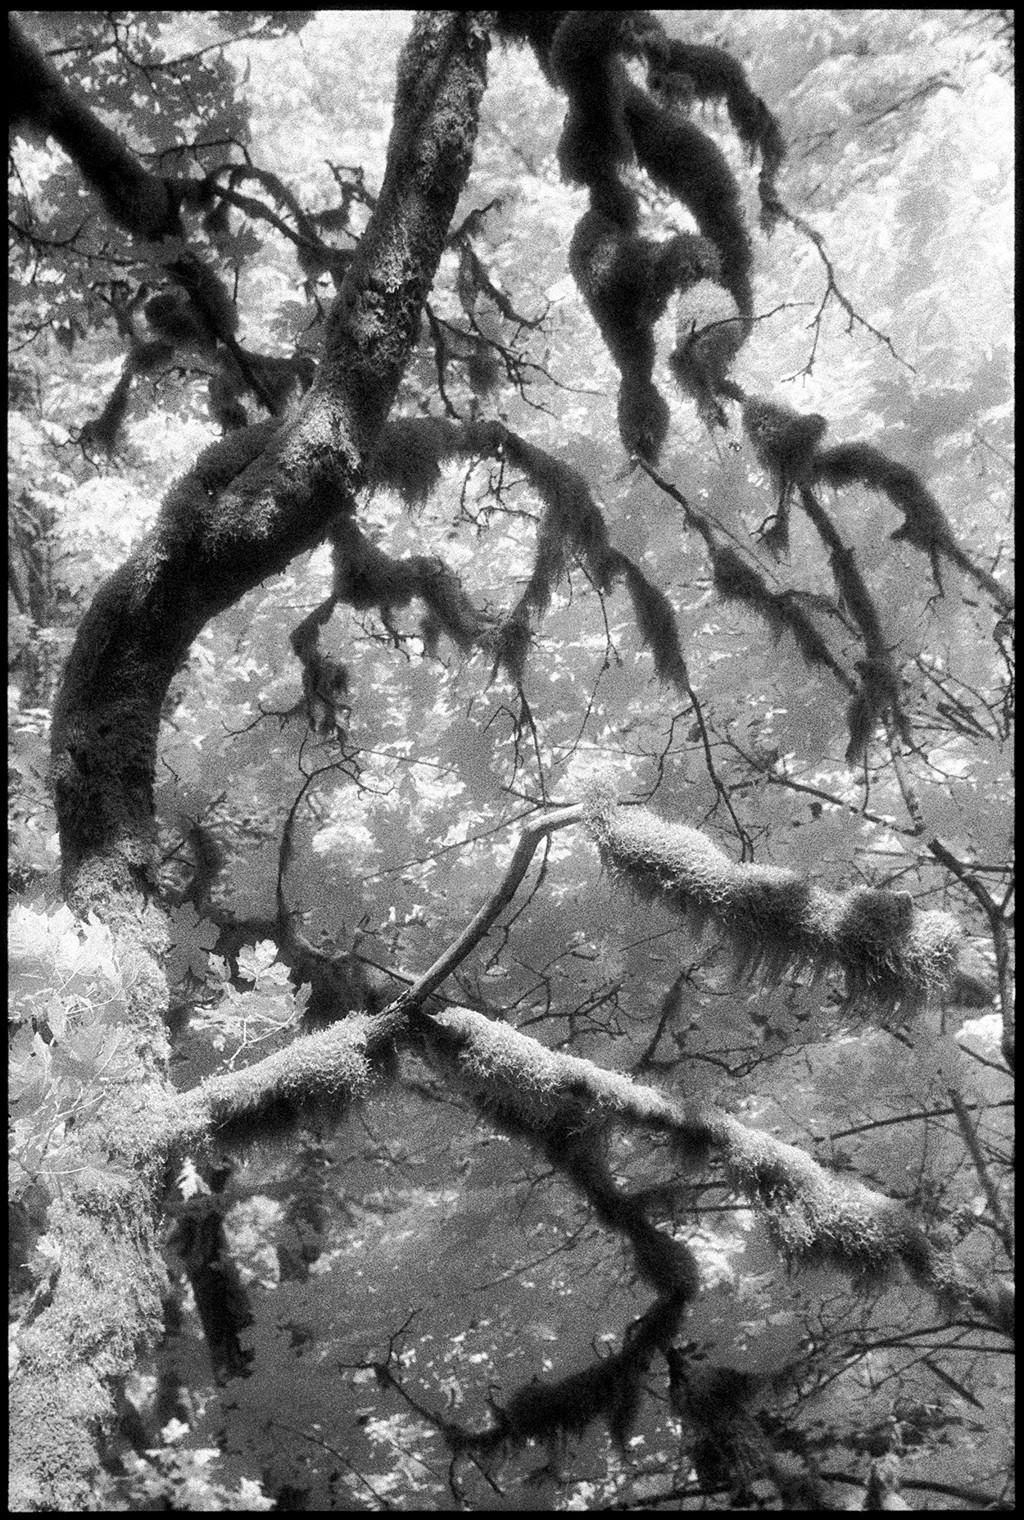 Multnomah Falls II by Edward C. Alfano